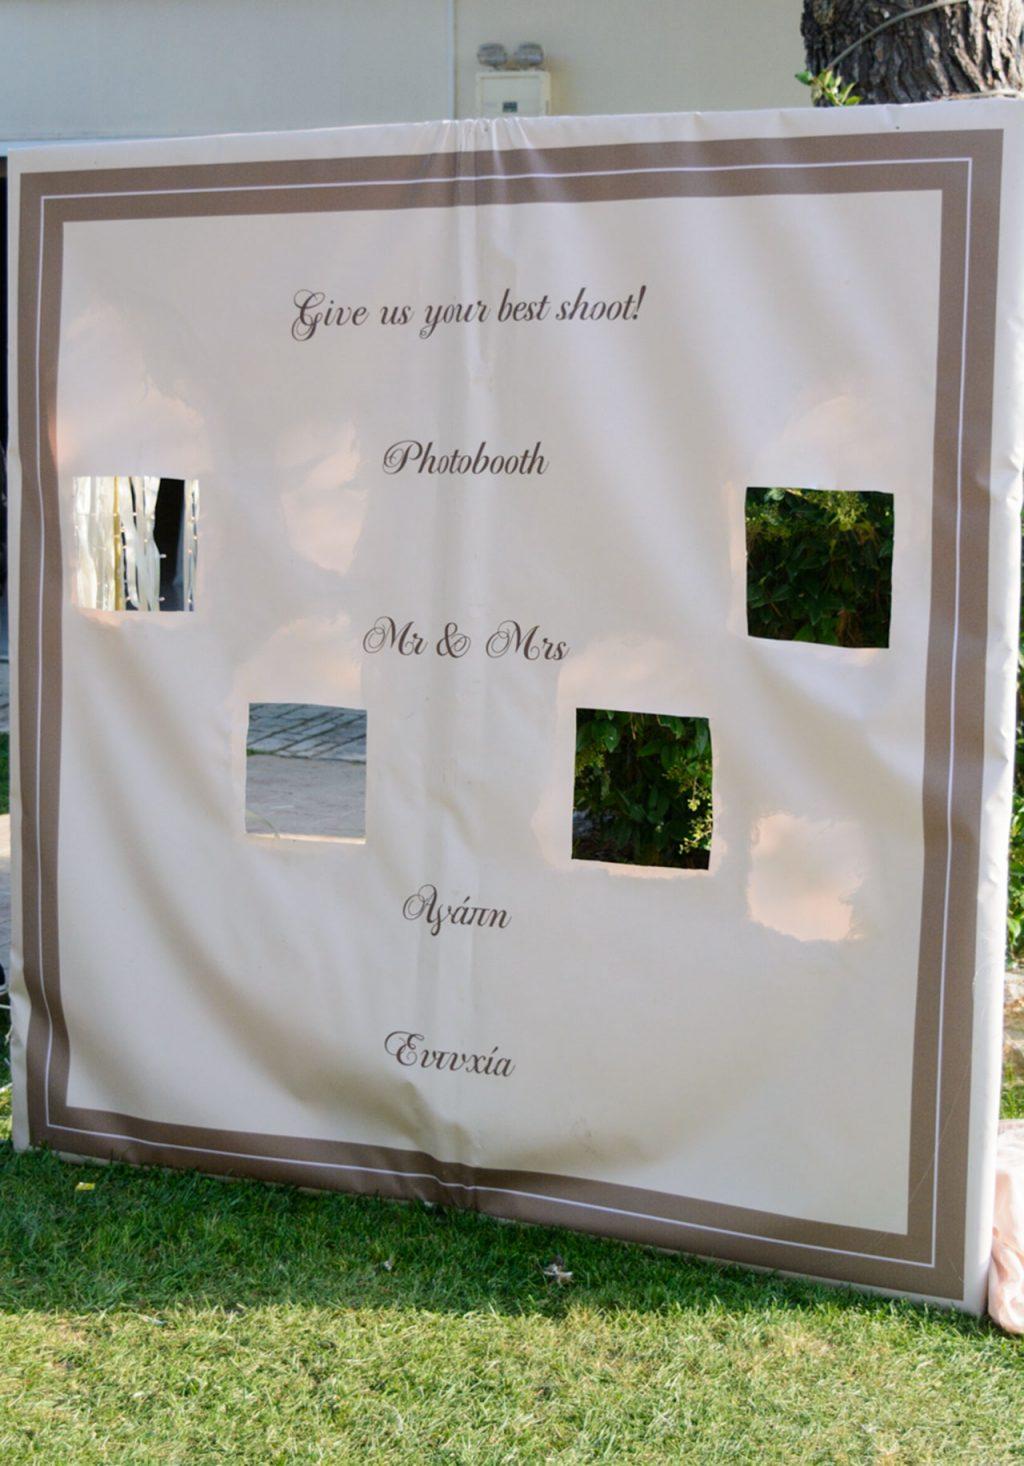 gamos-vaptisi-ktima-ariadni-fly-with-me-backdrop-photobooth